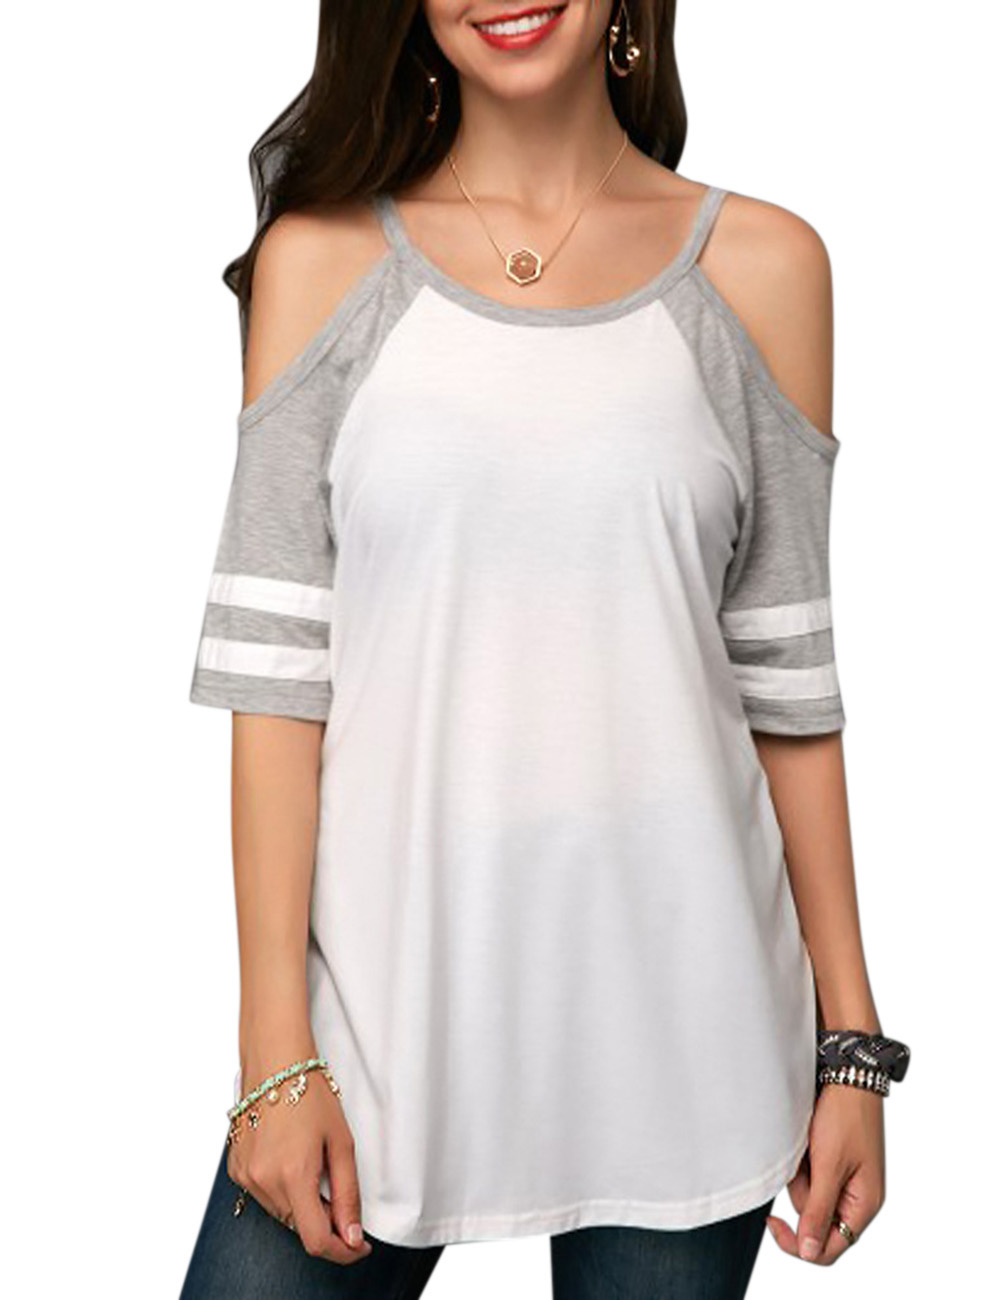 Women Off Shoulder T-Shirt Stylish Splicing Colour Short Sleeve Base Shirt Tops Gift